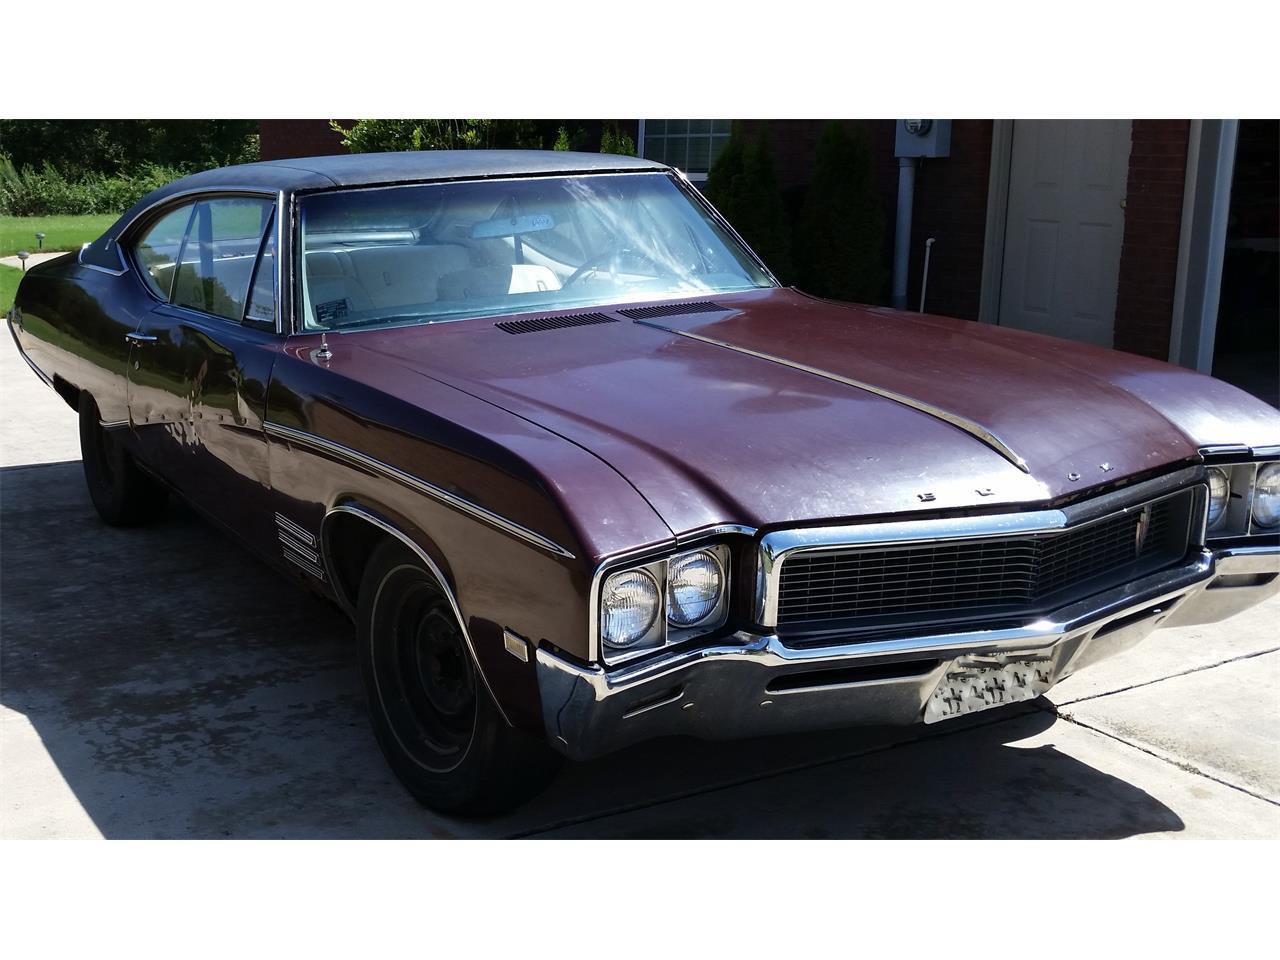 Large Picture of 1968 Skylark - $3,000.00 - CEAZ